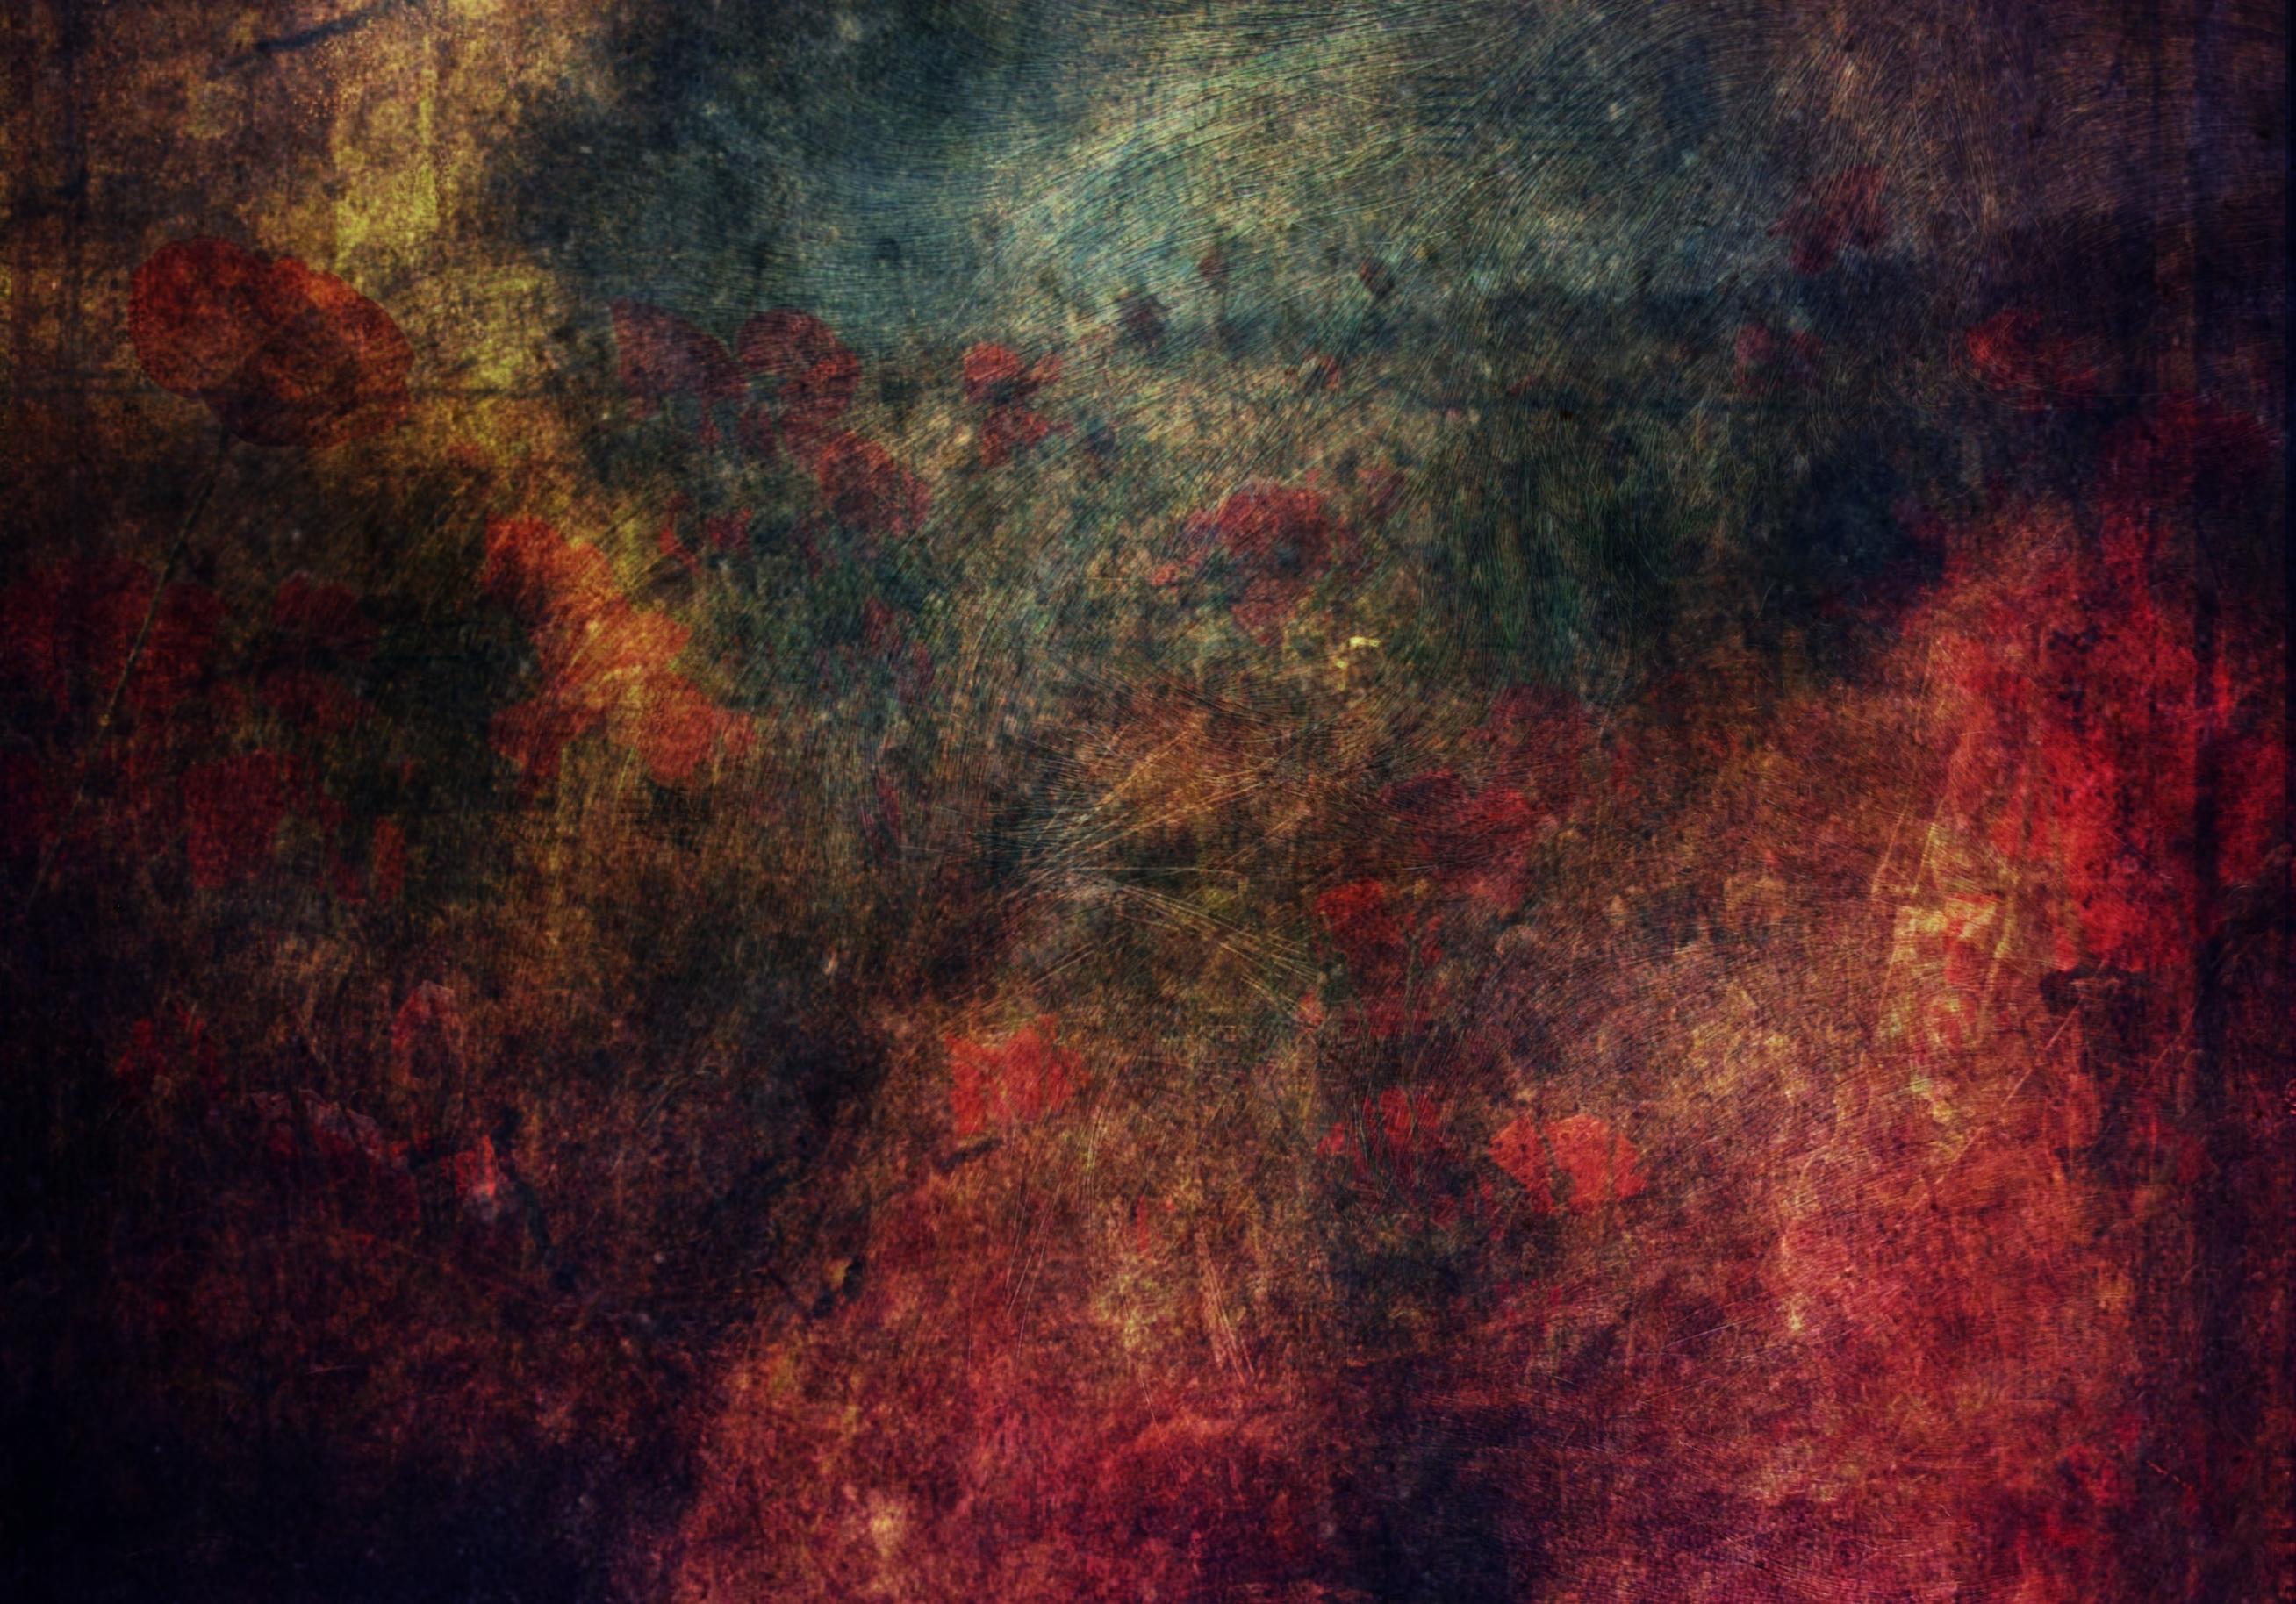 96836 baixar papel de parede Fundo, Escuro, Textura, Texturas, Manchas, Pontos, Lama, Sujeira - protetores de tela e imagens gratuitamente